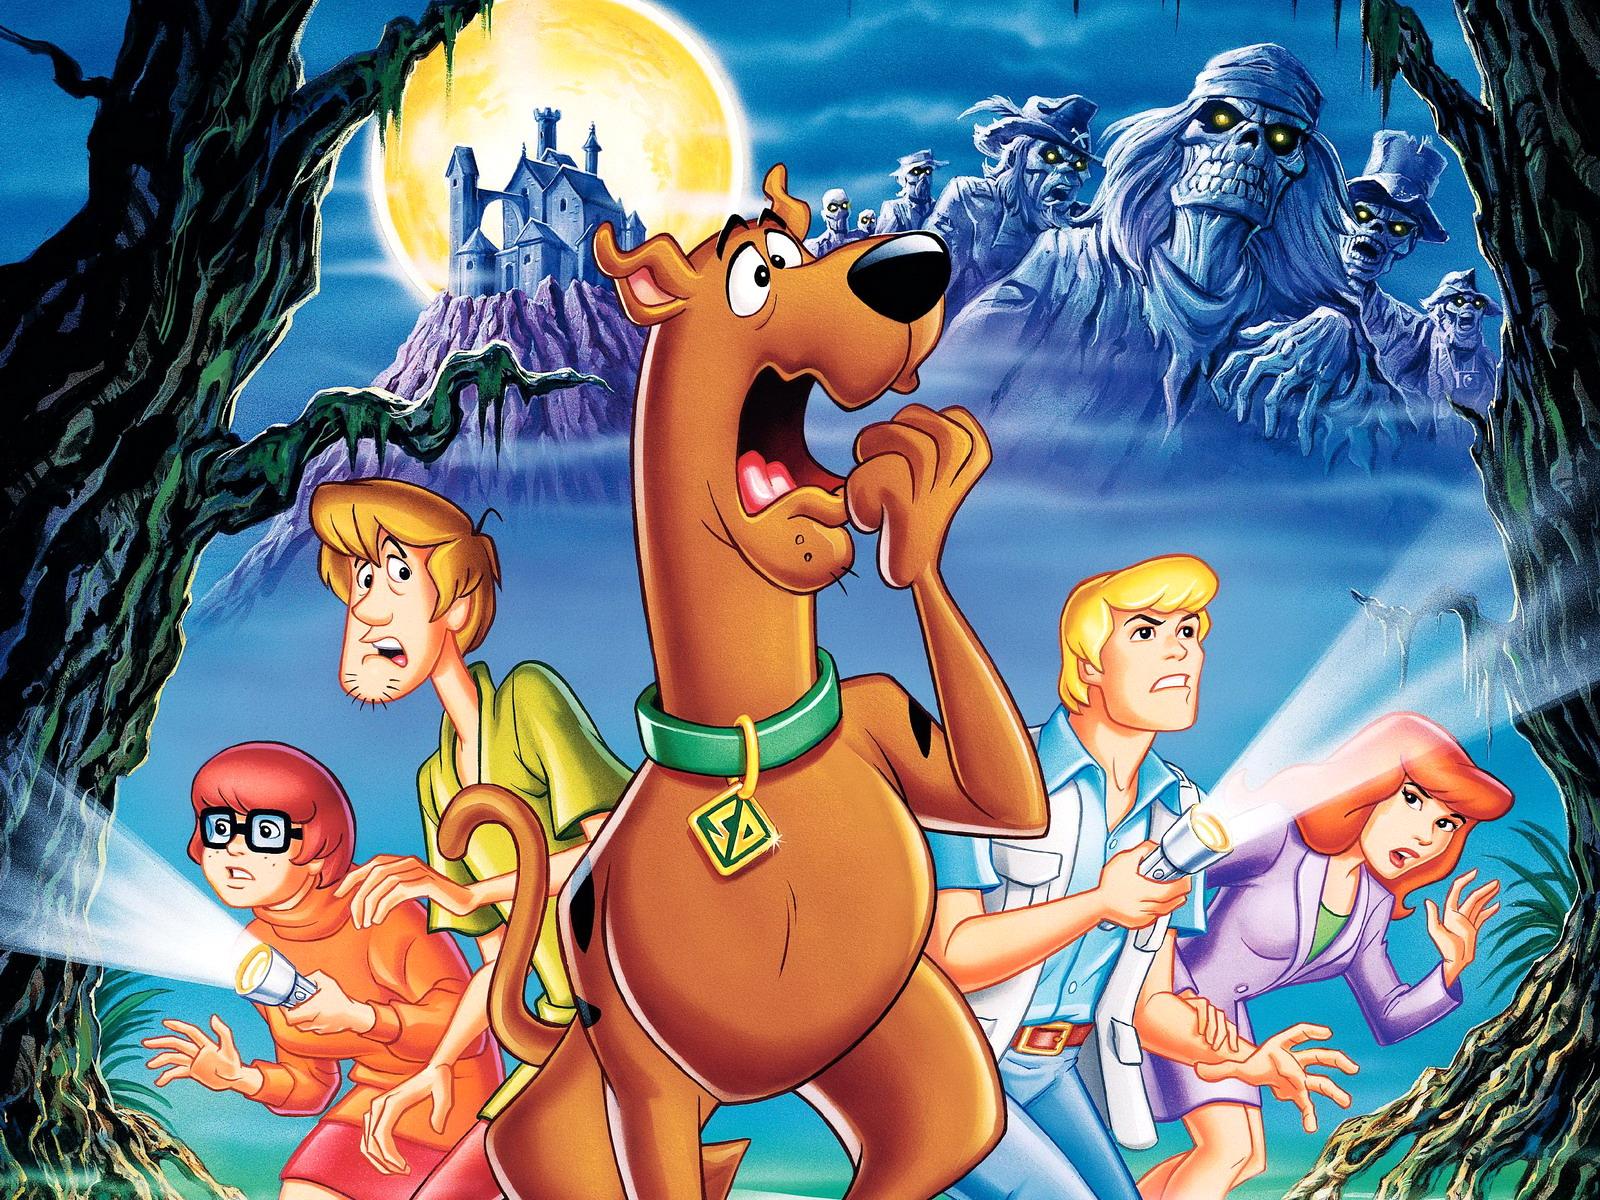 Scooby doo eating 4 balance scooby doo voltagebd Images